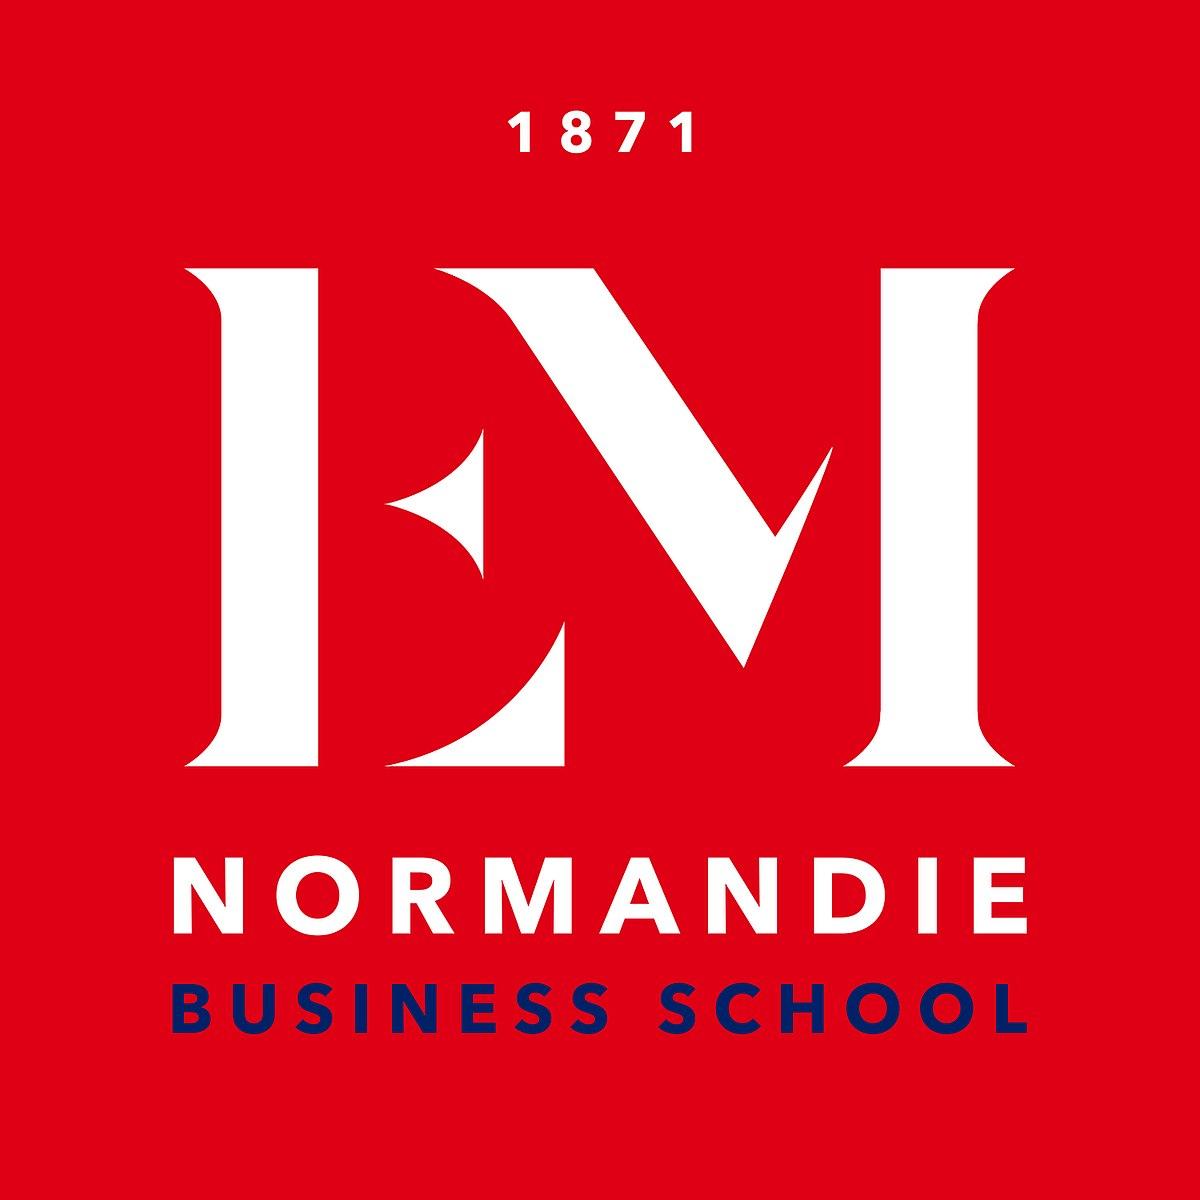 u00c9cole de management de normandie  u2014 wikip u00e9dia